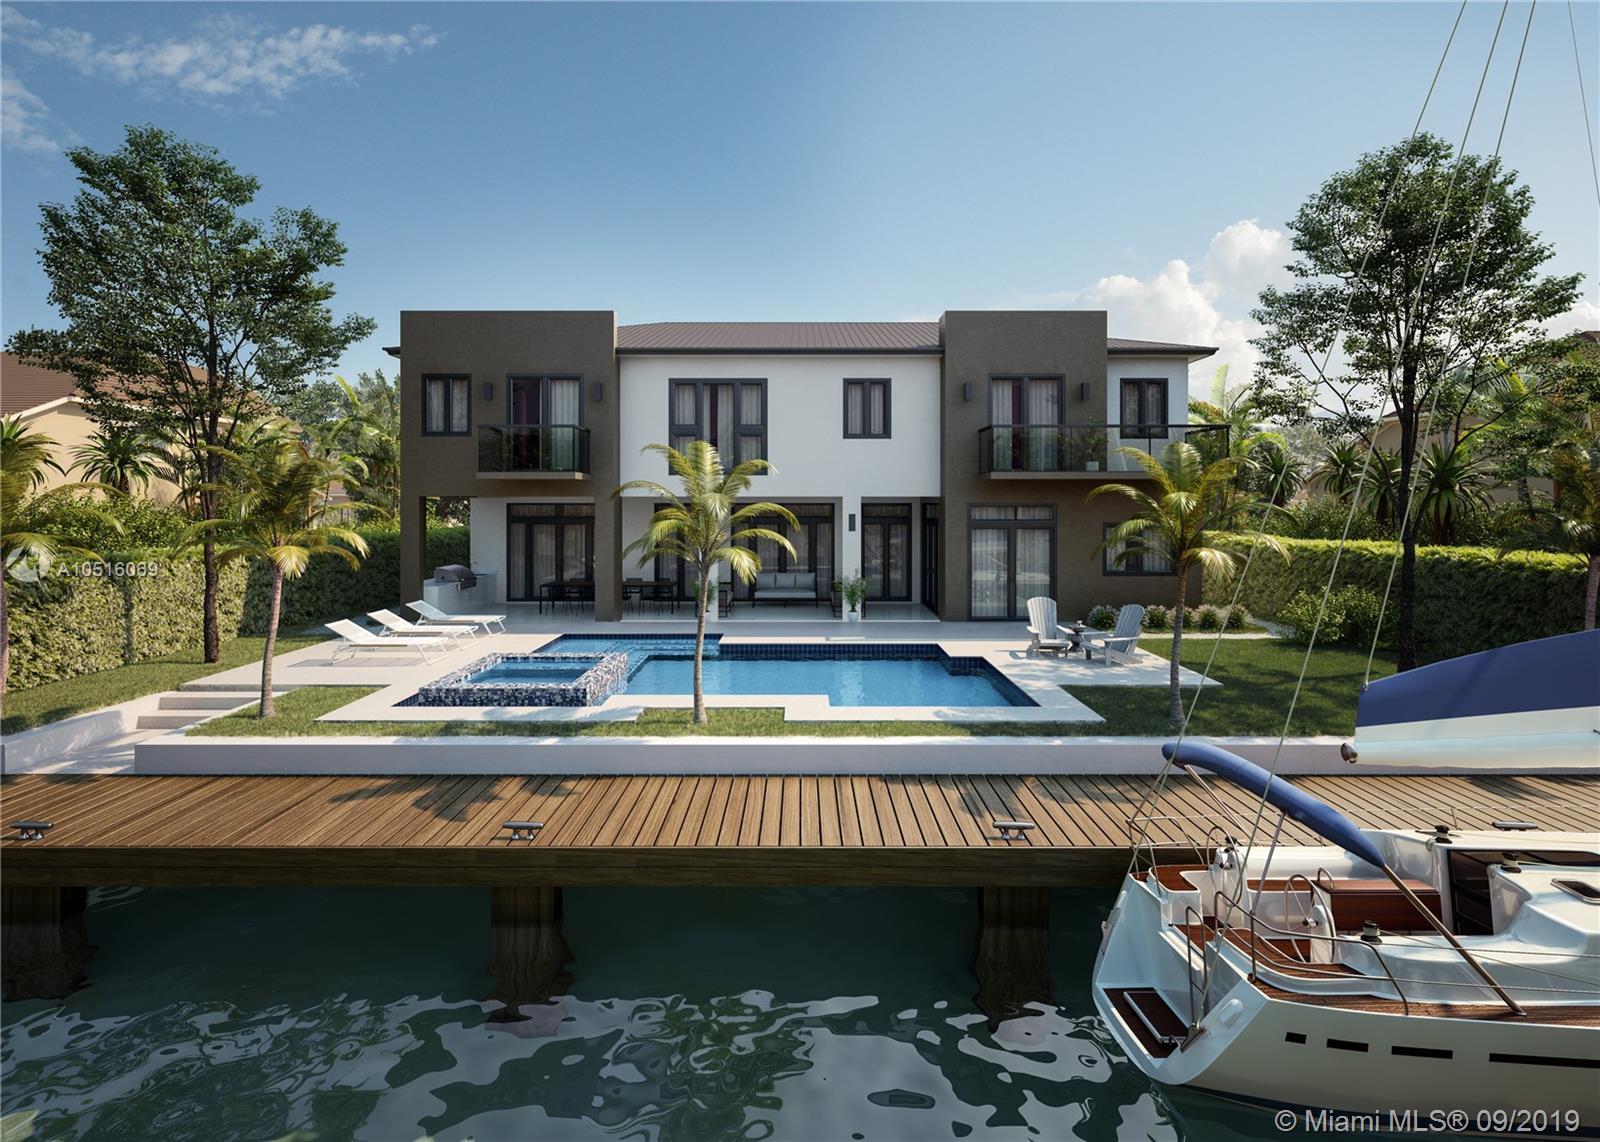 image #1 of property, Coral Key Villas 5th Sec